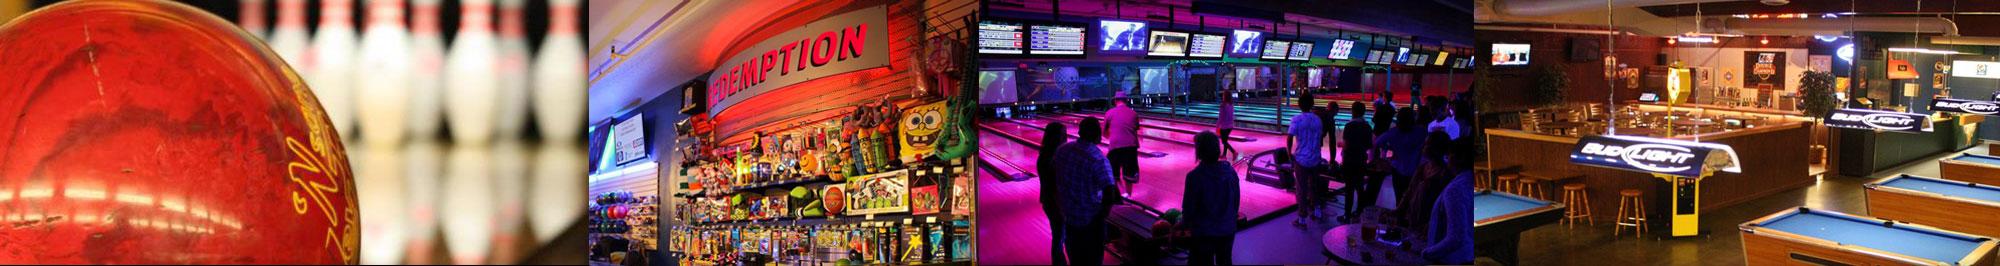 Emerald Lanes Bowling, Boise Idaho